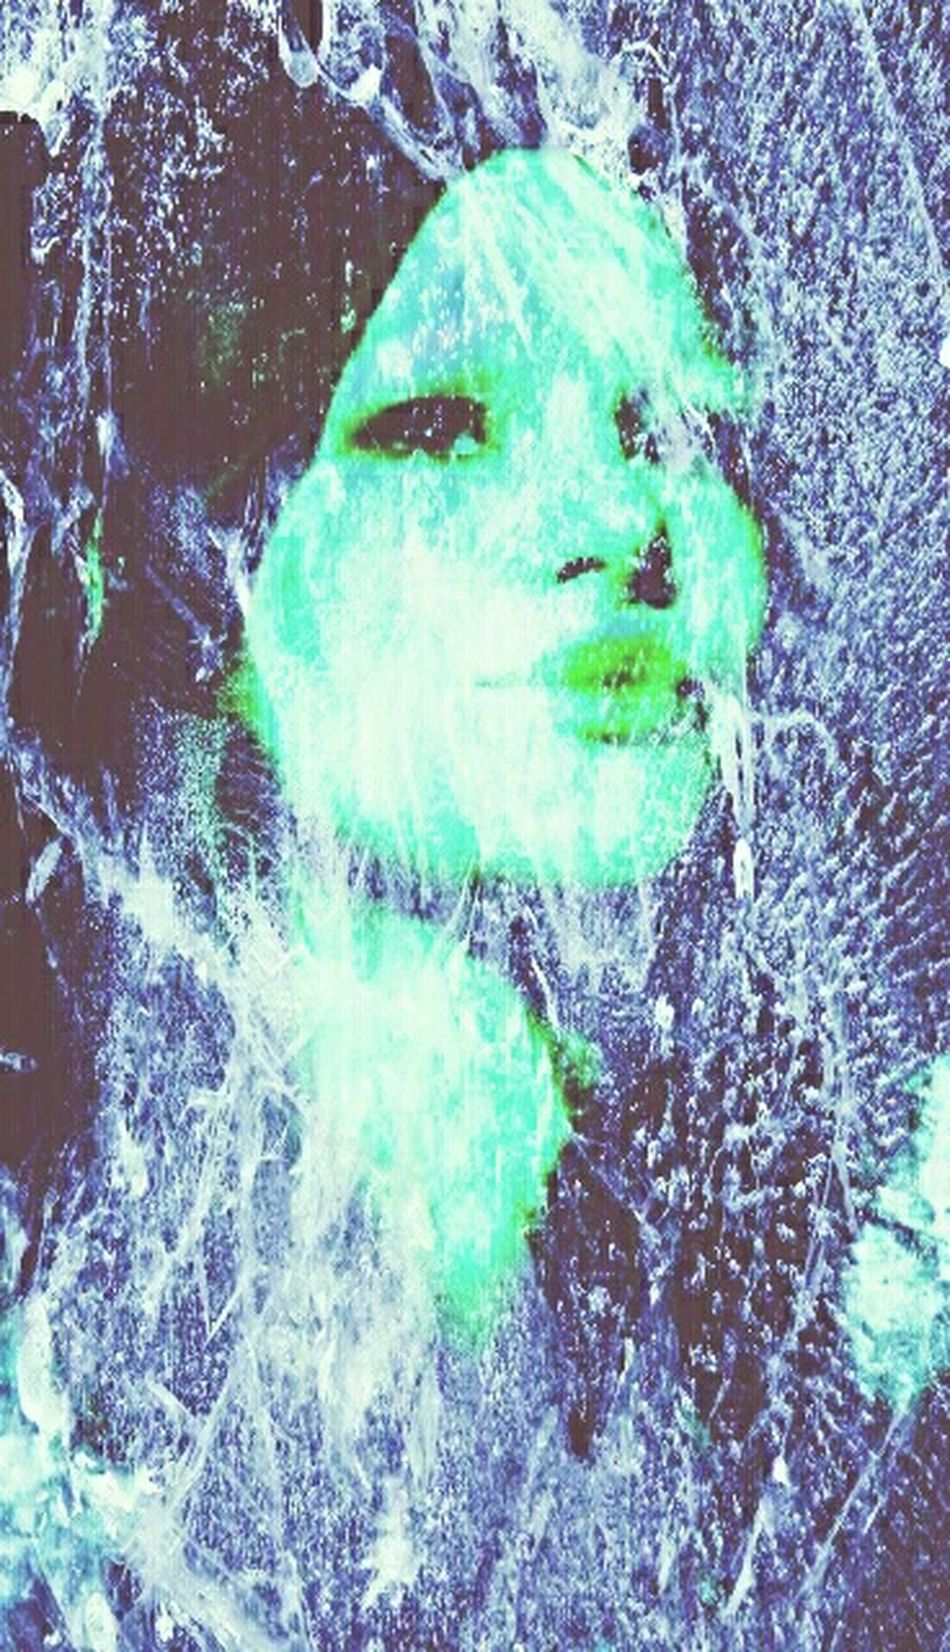 Taking Photos Art Edited Vintage Moments That's Me Rainy Day Feeling Blue I Tree Hugger Hi